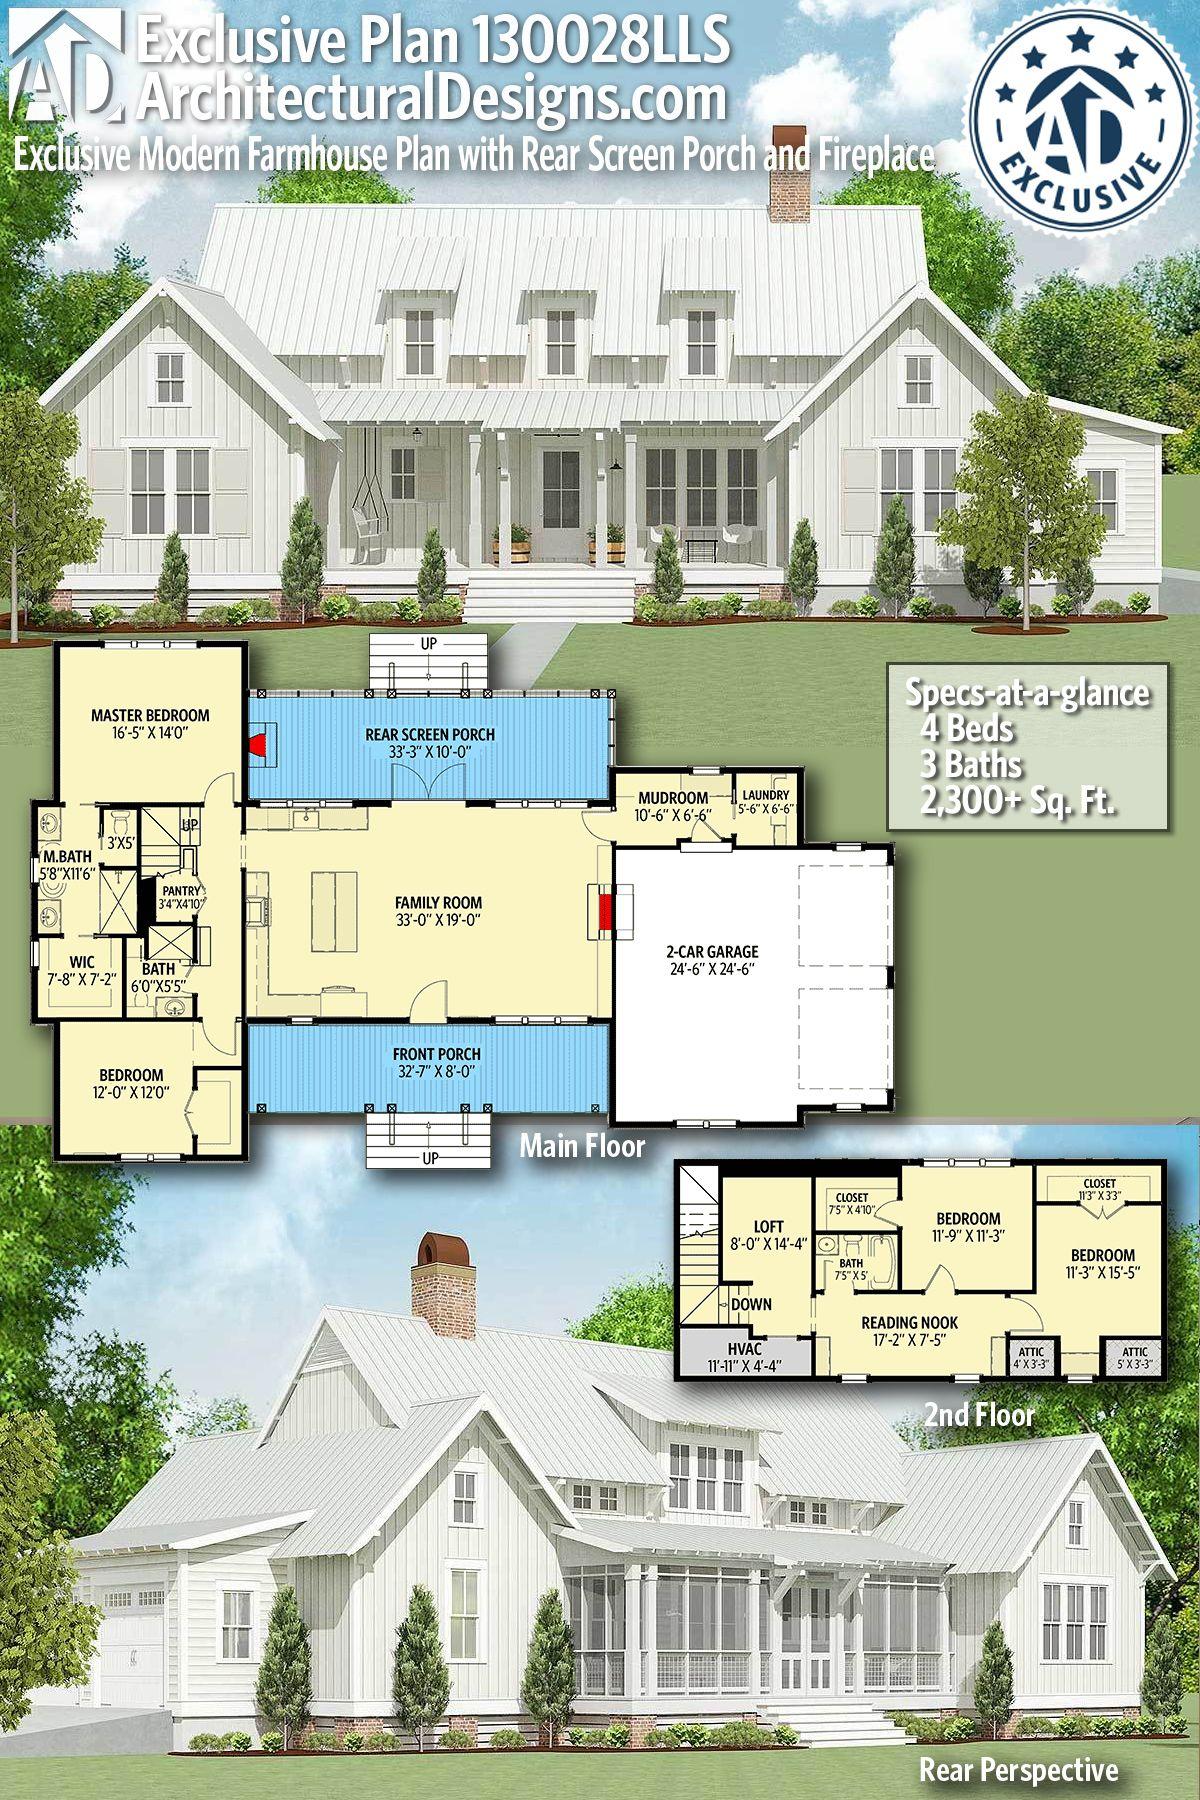 Modern Farmhouse Plan 130028lls Gives You 4 Beds 3 Bath 2 300 Sf Wouldn T You Swap T Modern Farmhouse Plans Farmhouse Plans Architectural Design House Plans